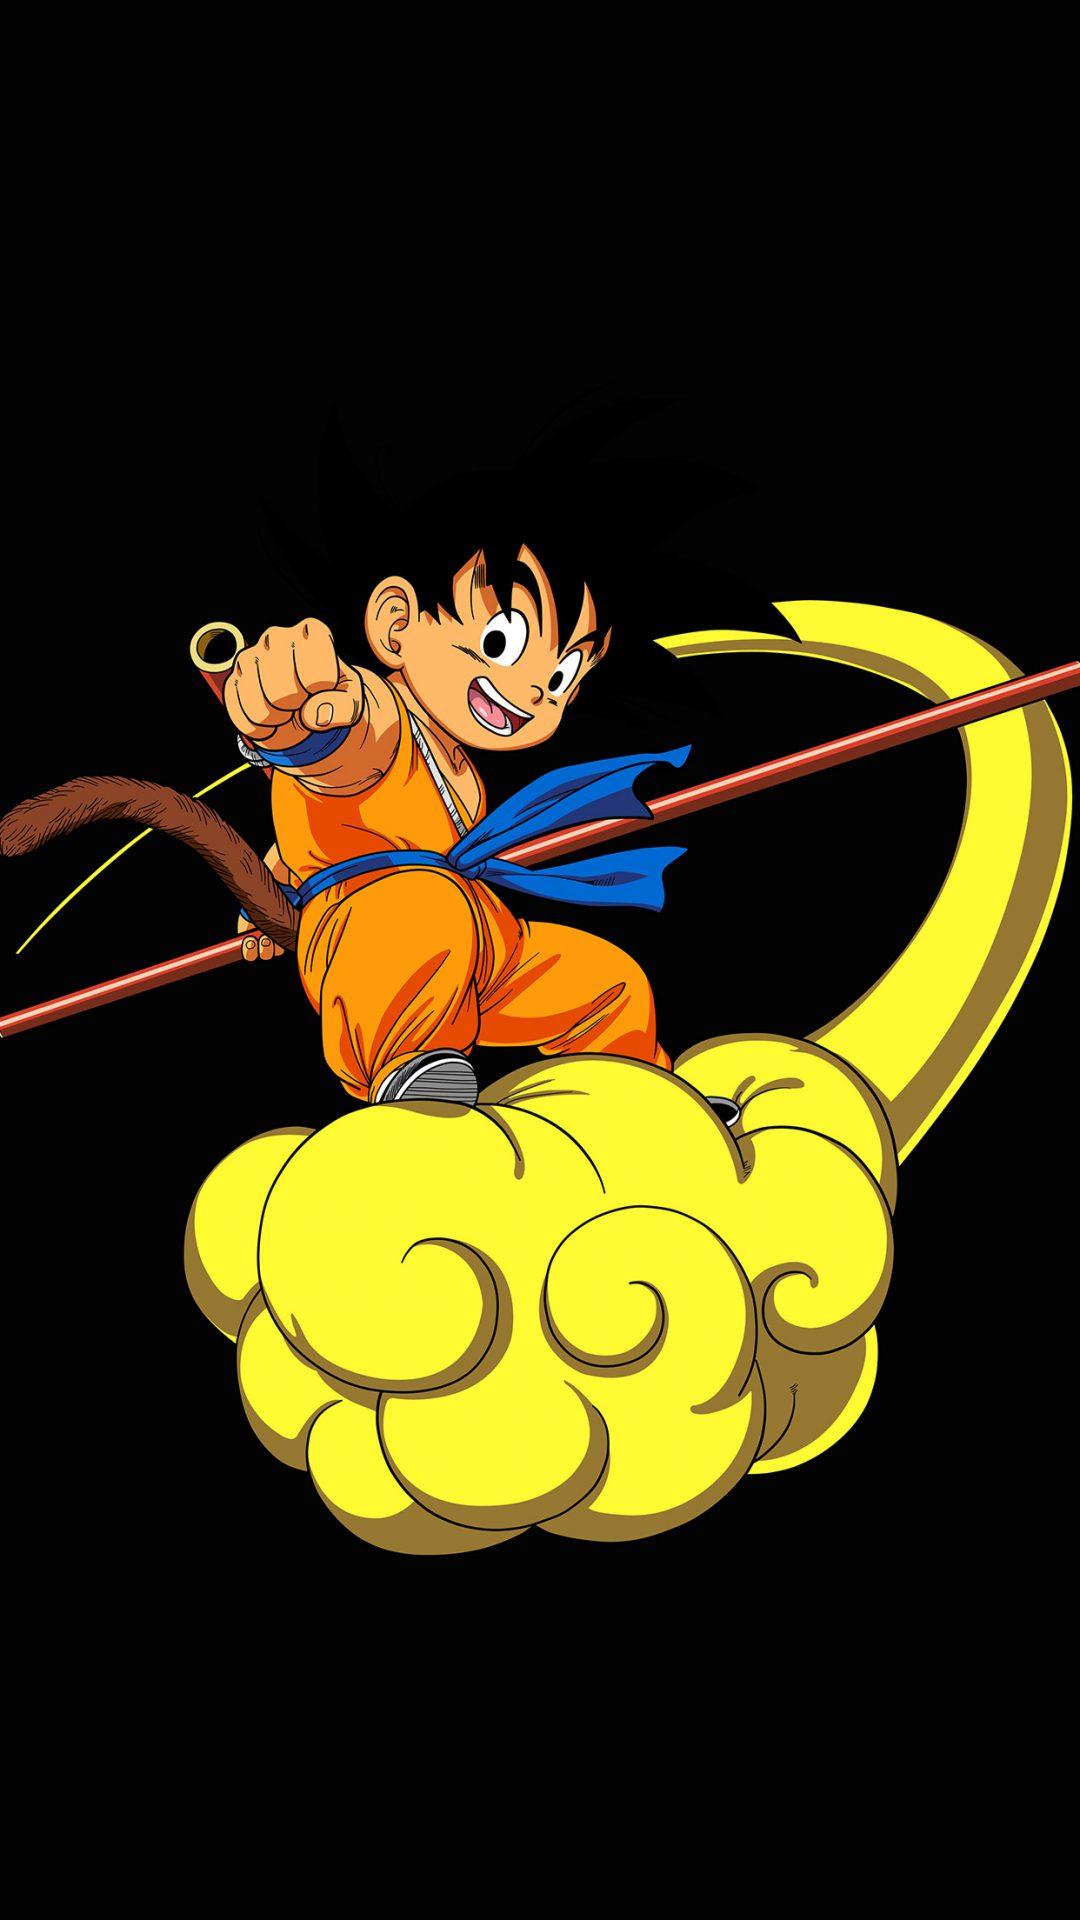 Dragonball Goku Cloud Fly Anime Art Illust